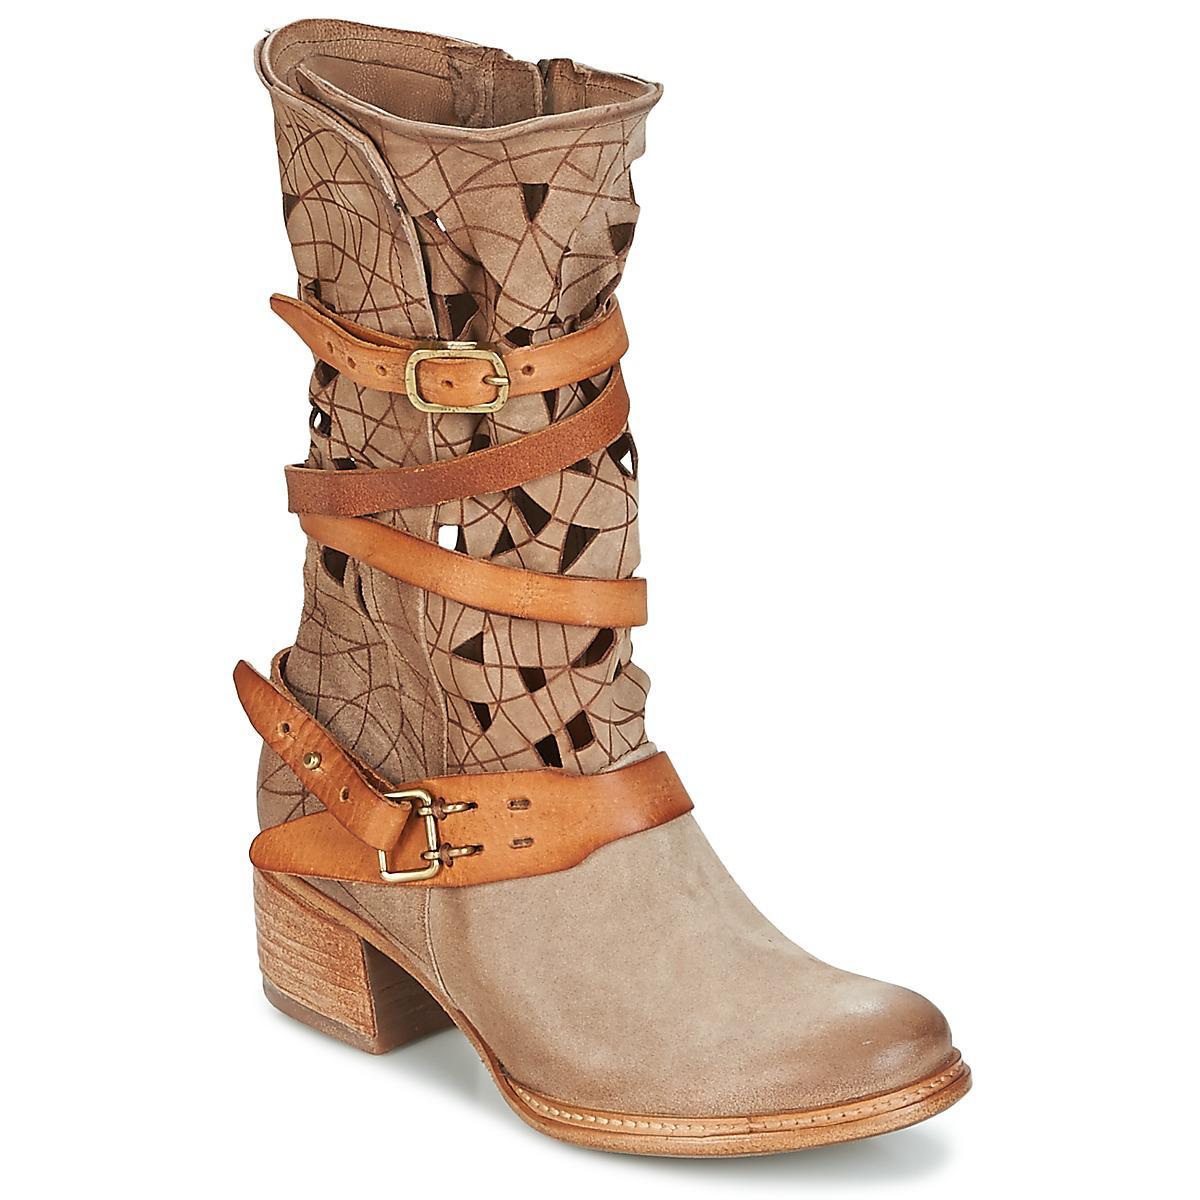 782922560f0dc Lyst - CRUZ femmes Boots en Beige Airstep   A.S.98 en coloris Neutre